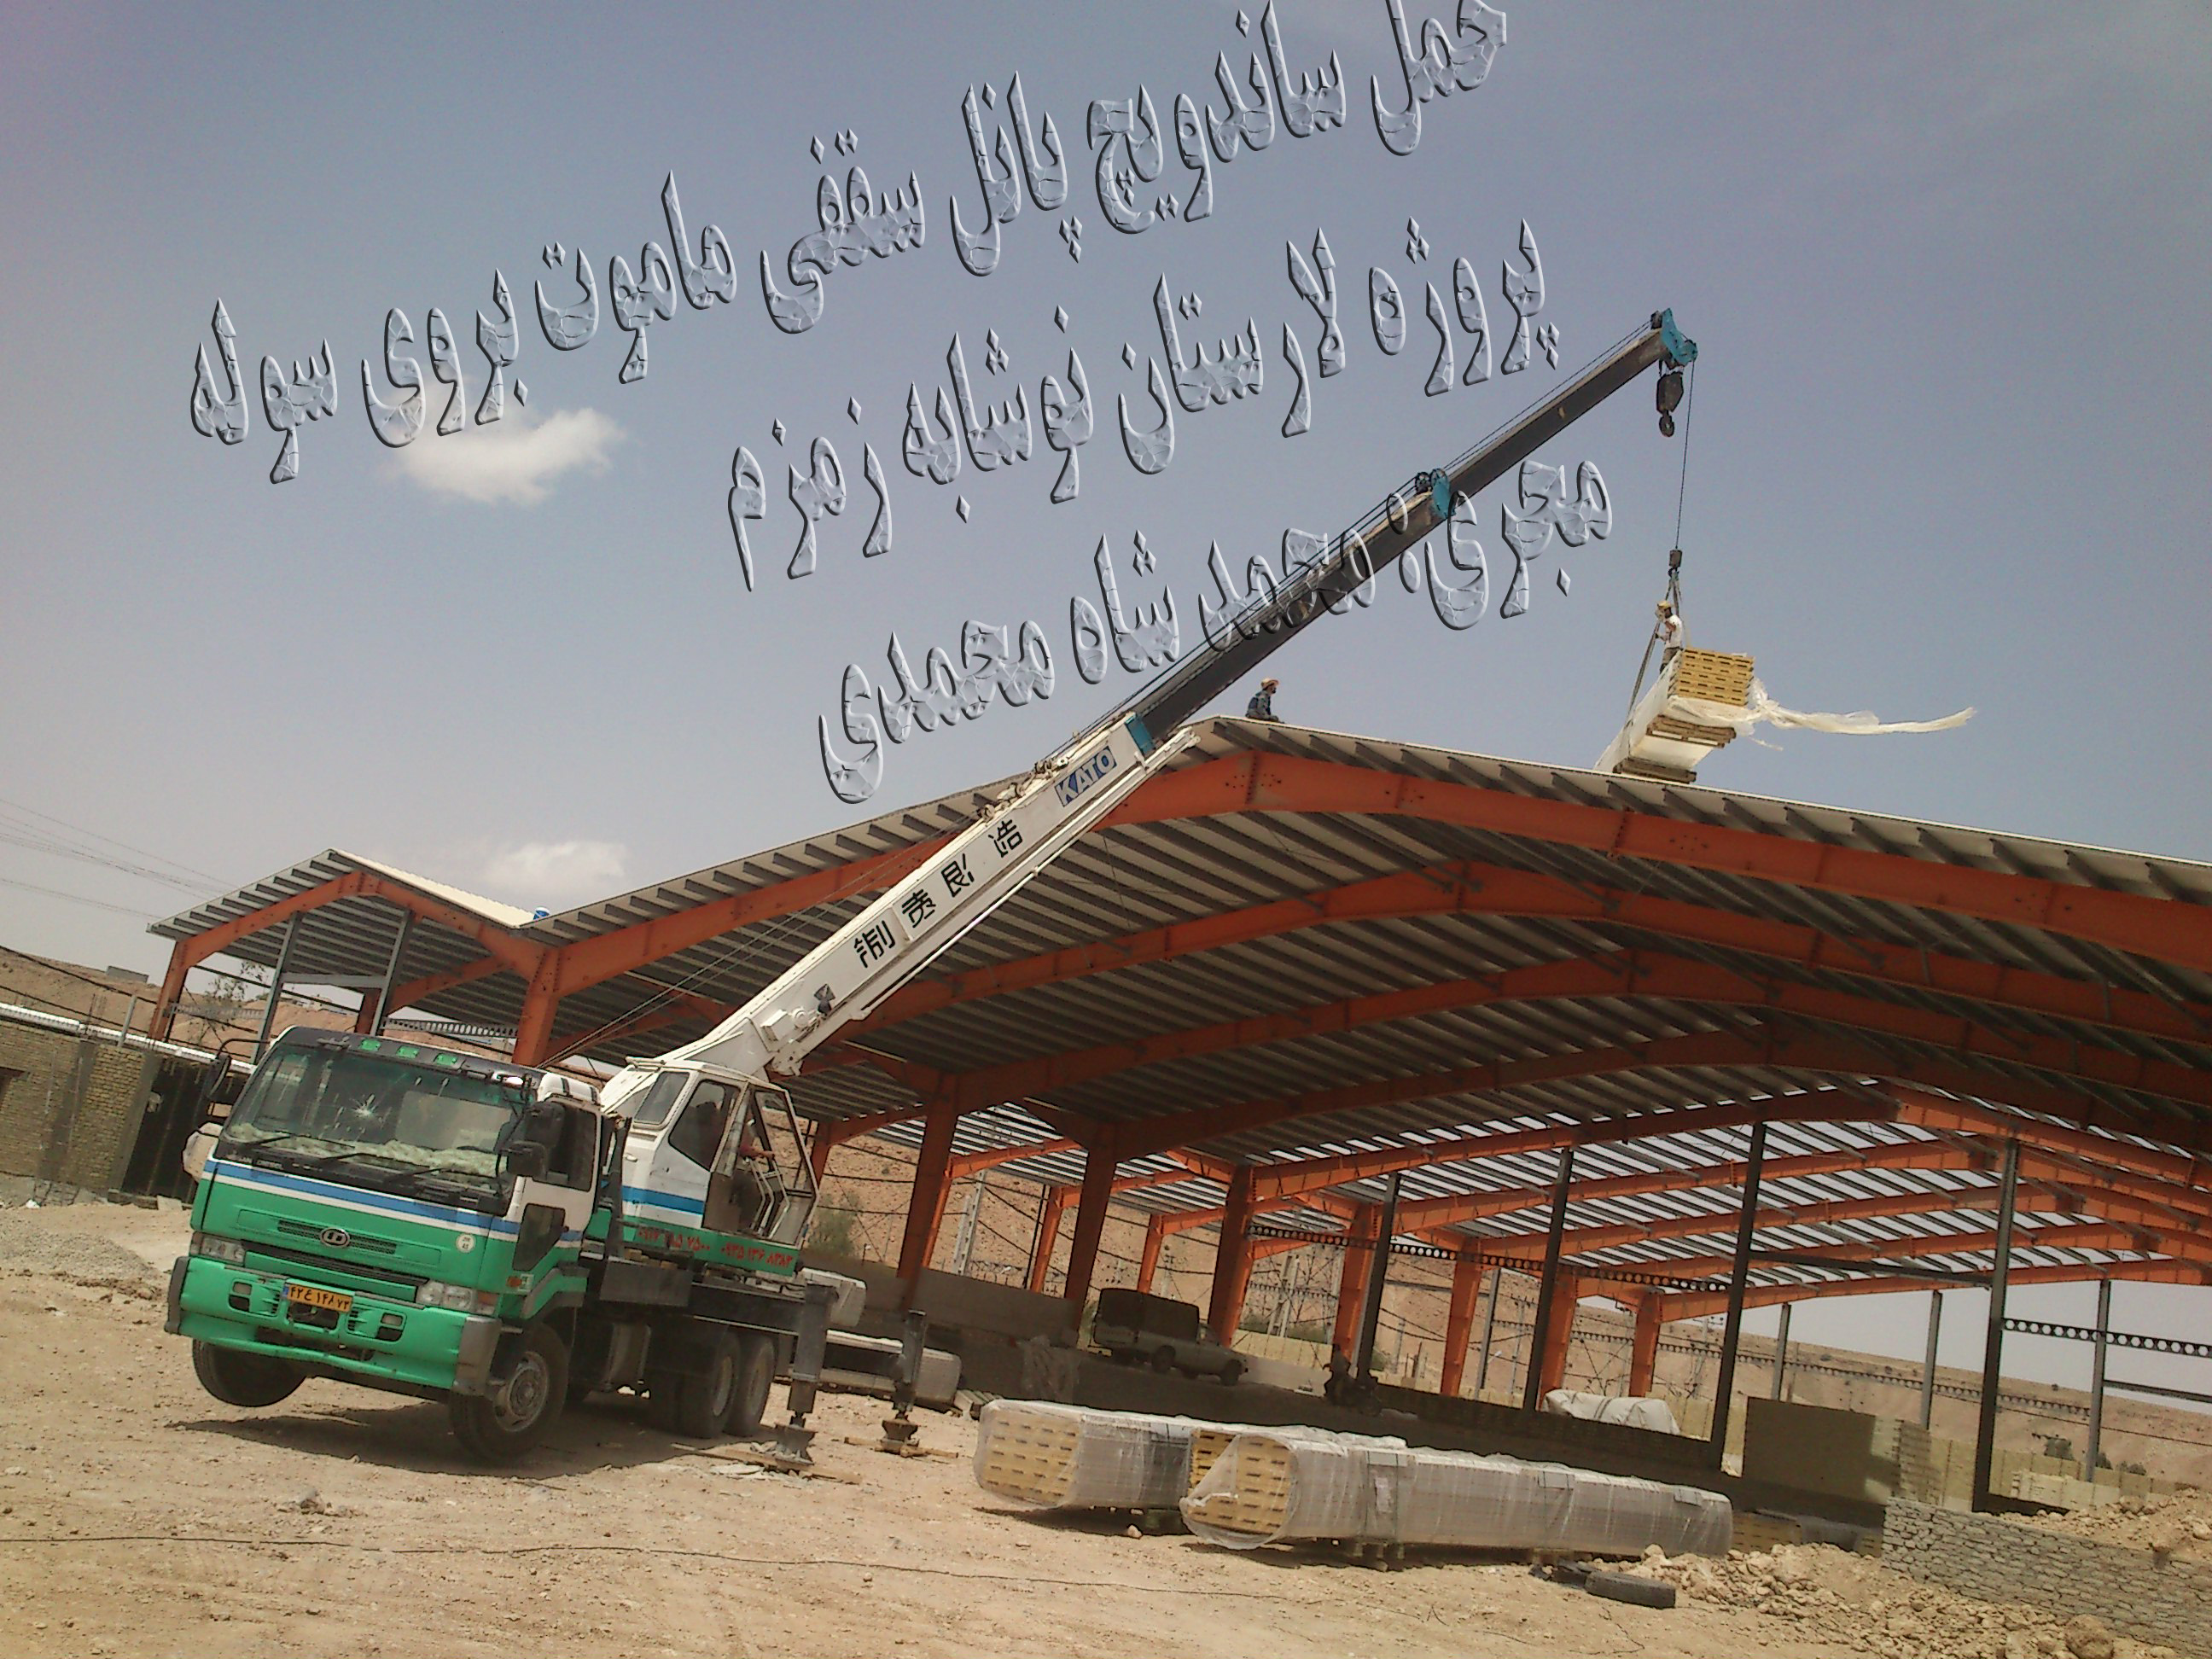 روش اجرای ساندویچ پانل سقفی,قیمت نصب پانل دیواری با زیرسازی ...ساندویچ پانل کانکس,ورق رنگی